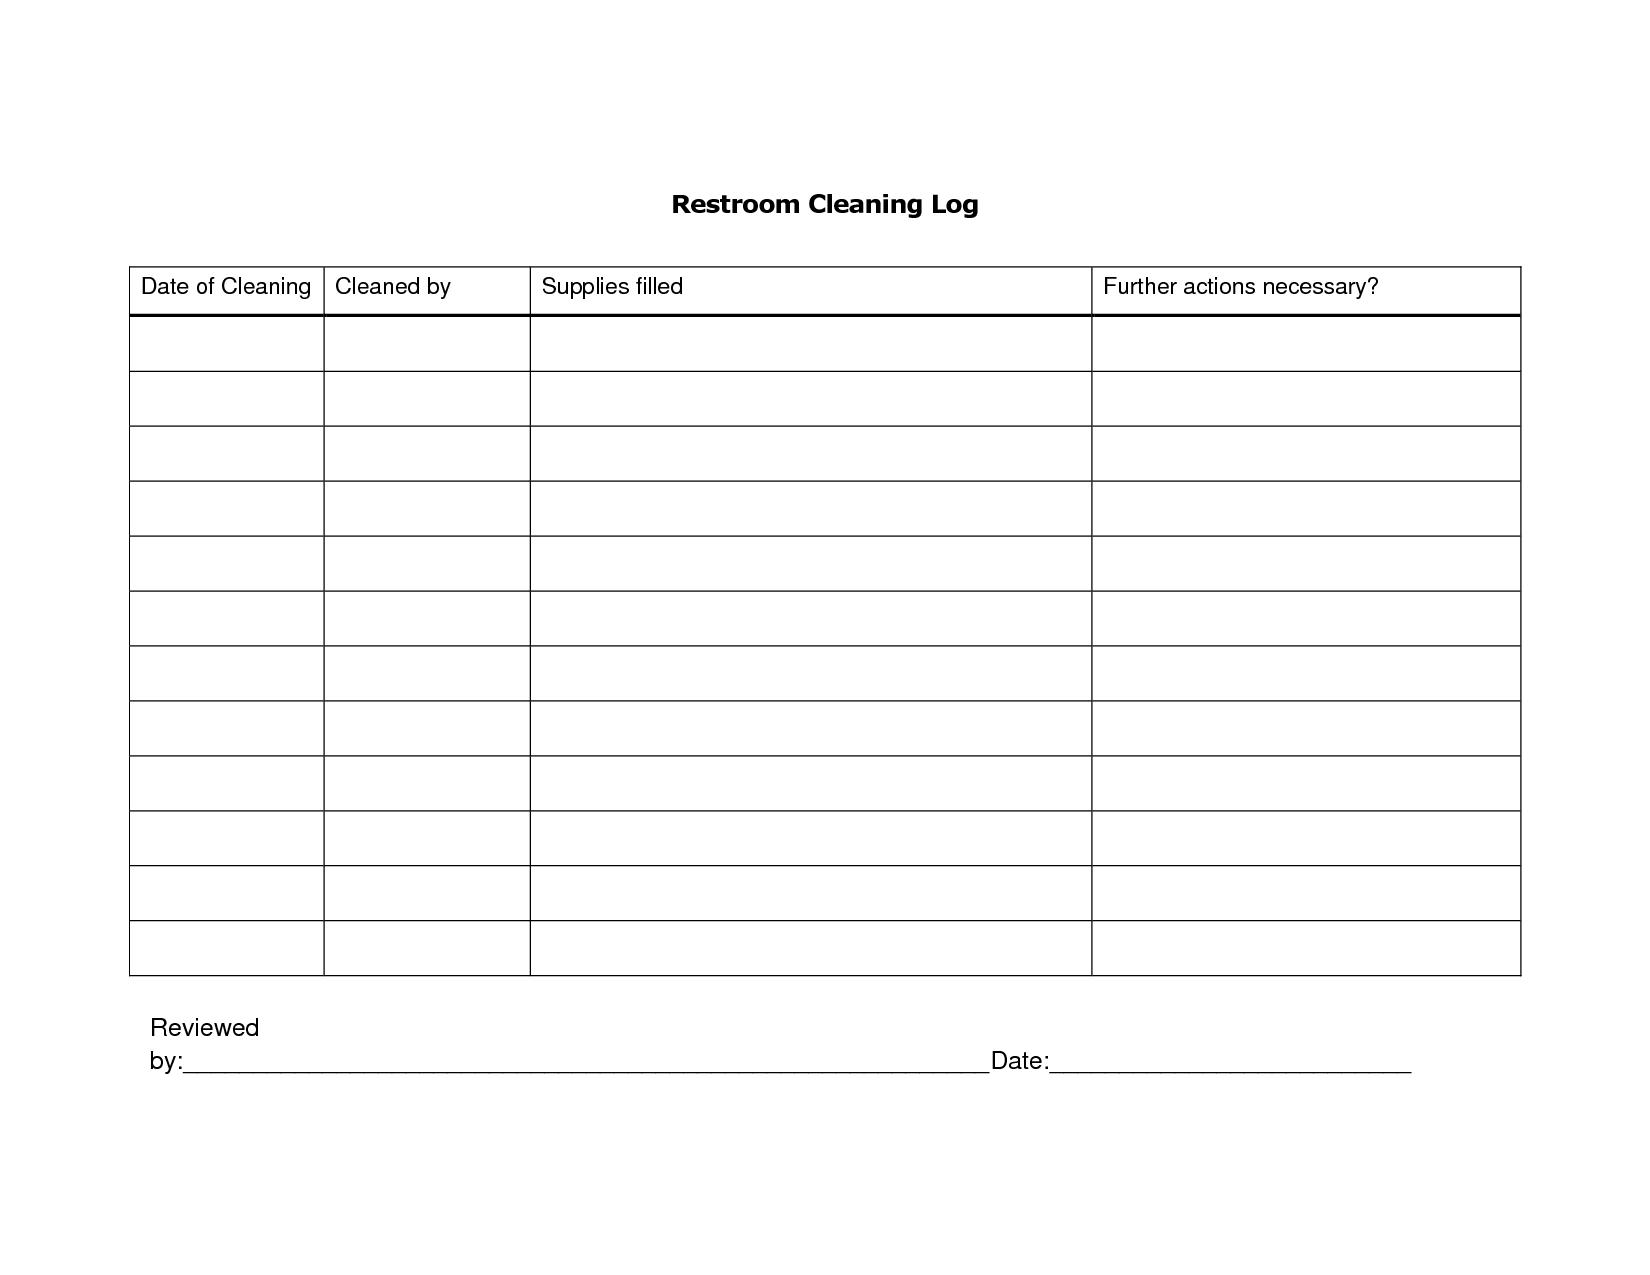 Bathroom+Cleaning+Log+Sheet+Template in 2020 | Bathroom ...